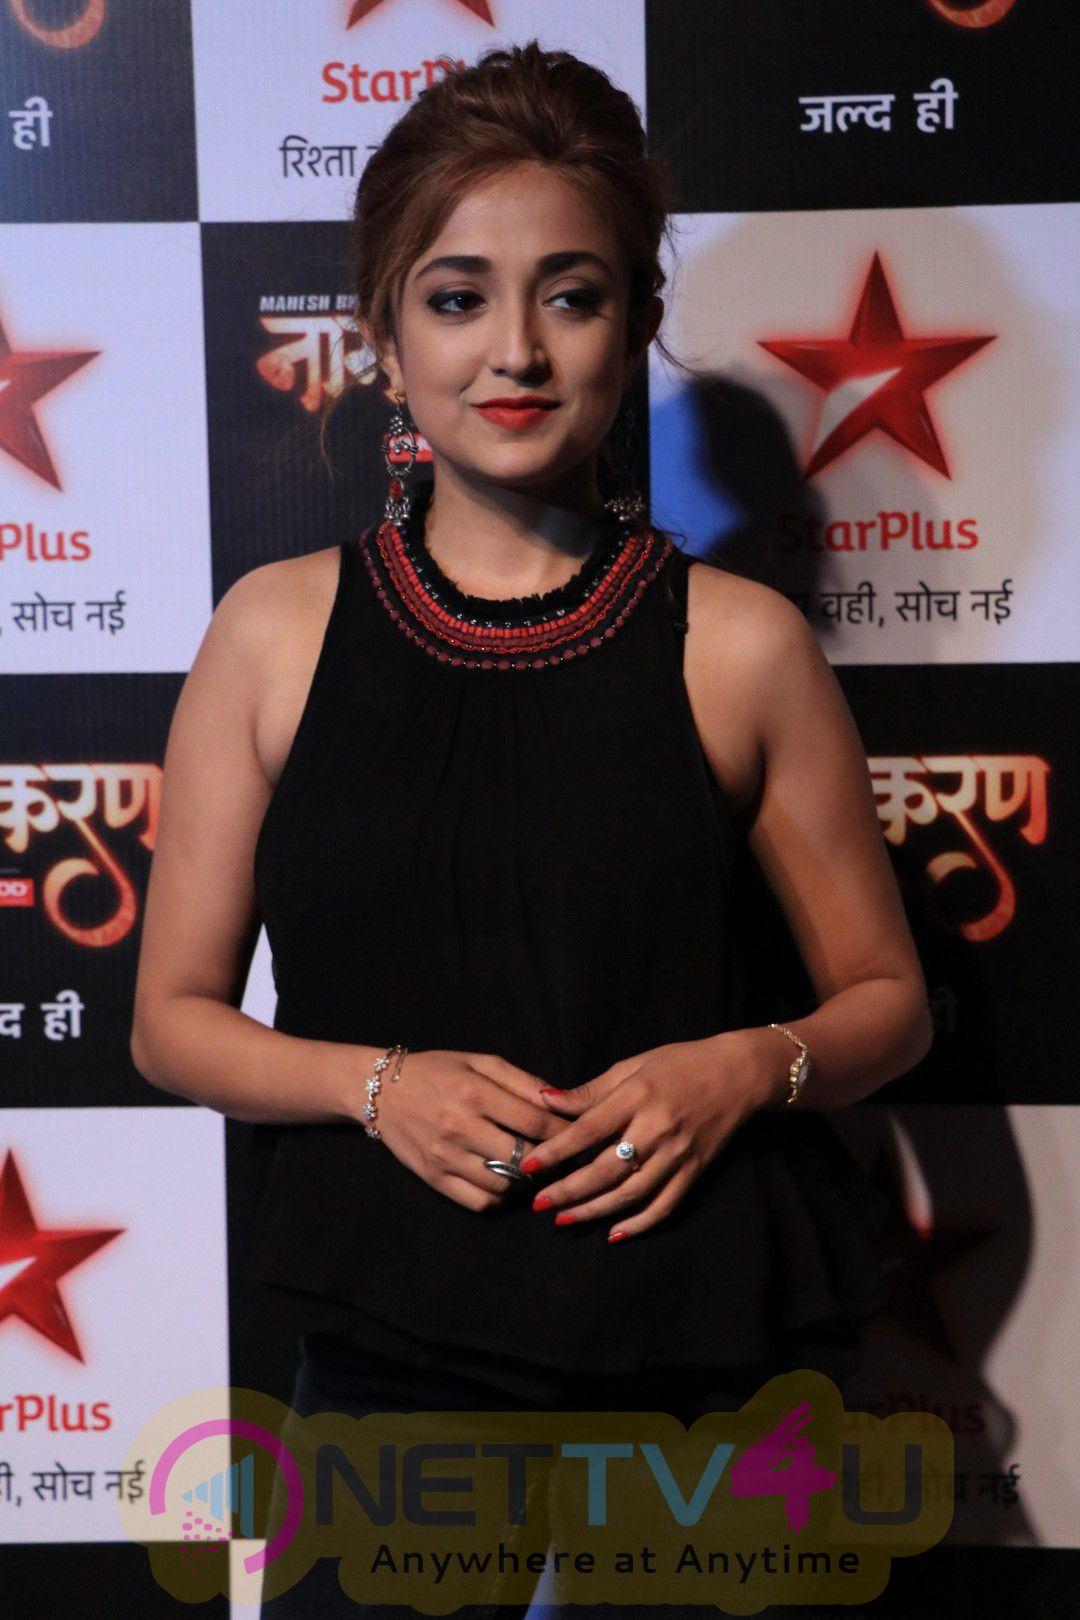 Naamkarann New TV Show Launched By Mahesh Bhatt Photos Hindi Gallery